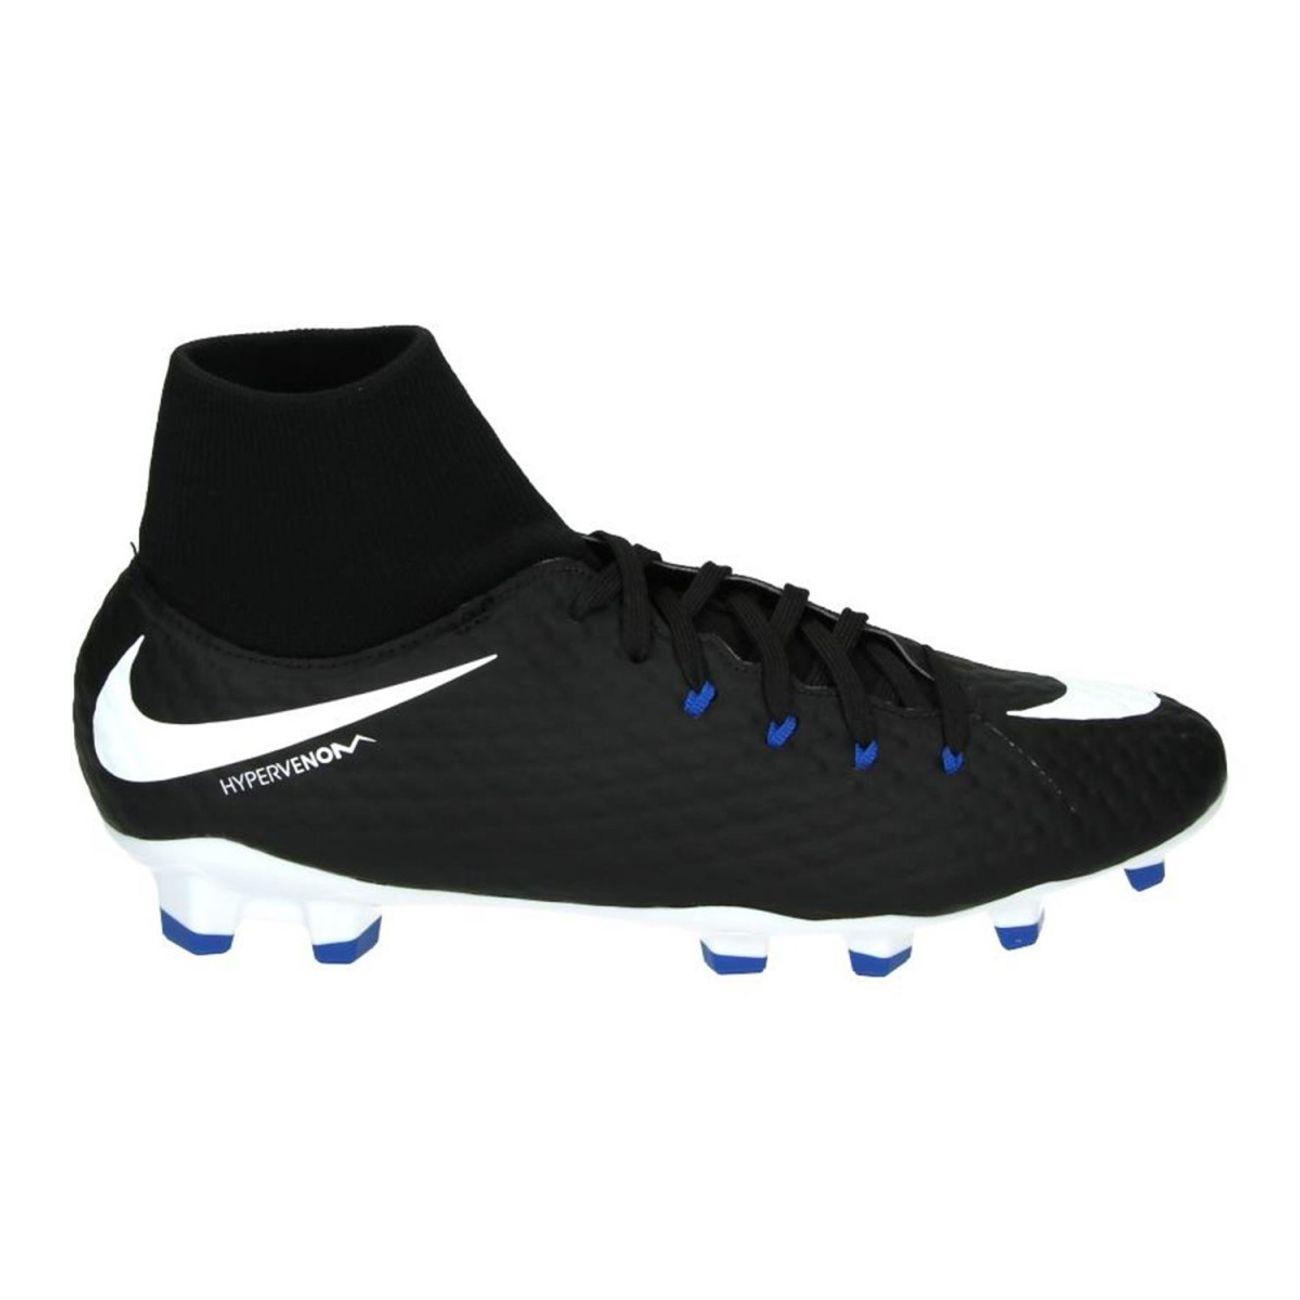 Fit Chaussure Football Phelon De Dynamic Nike Ii Fg Hypervenom hQrCxtsd